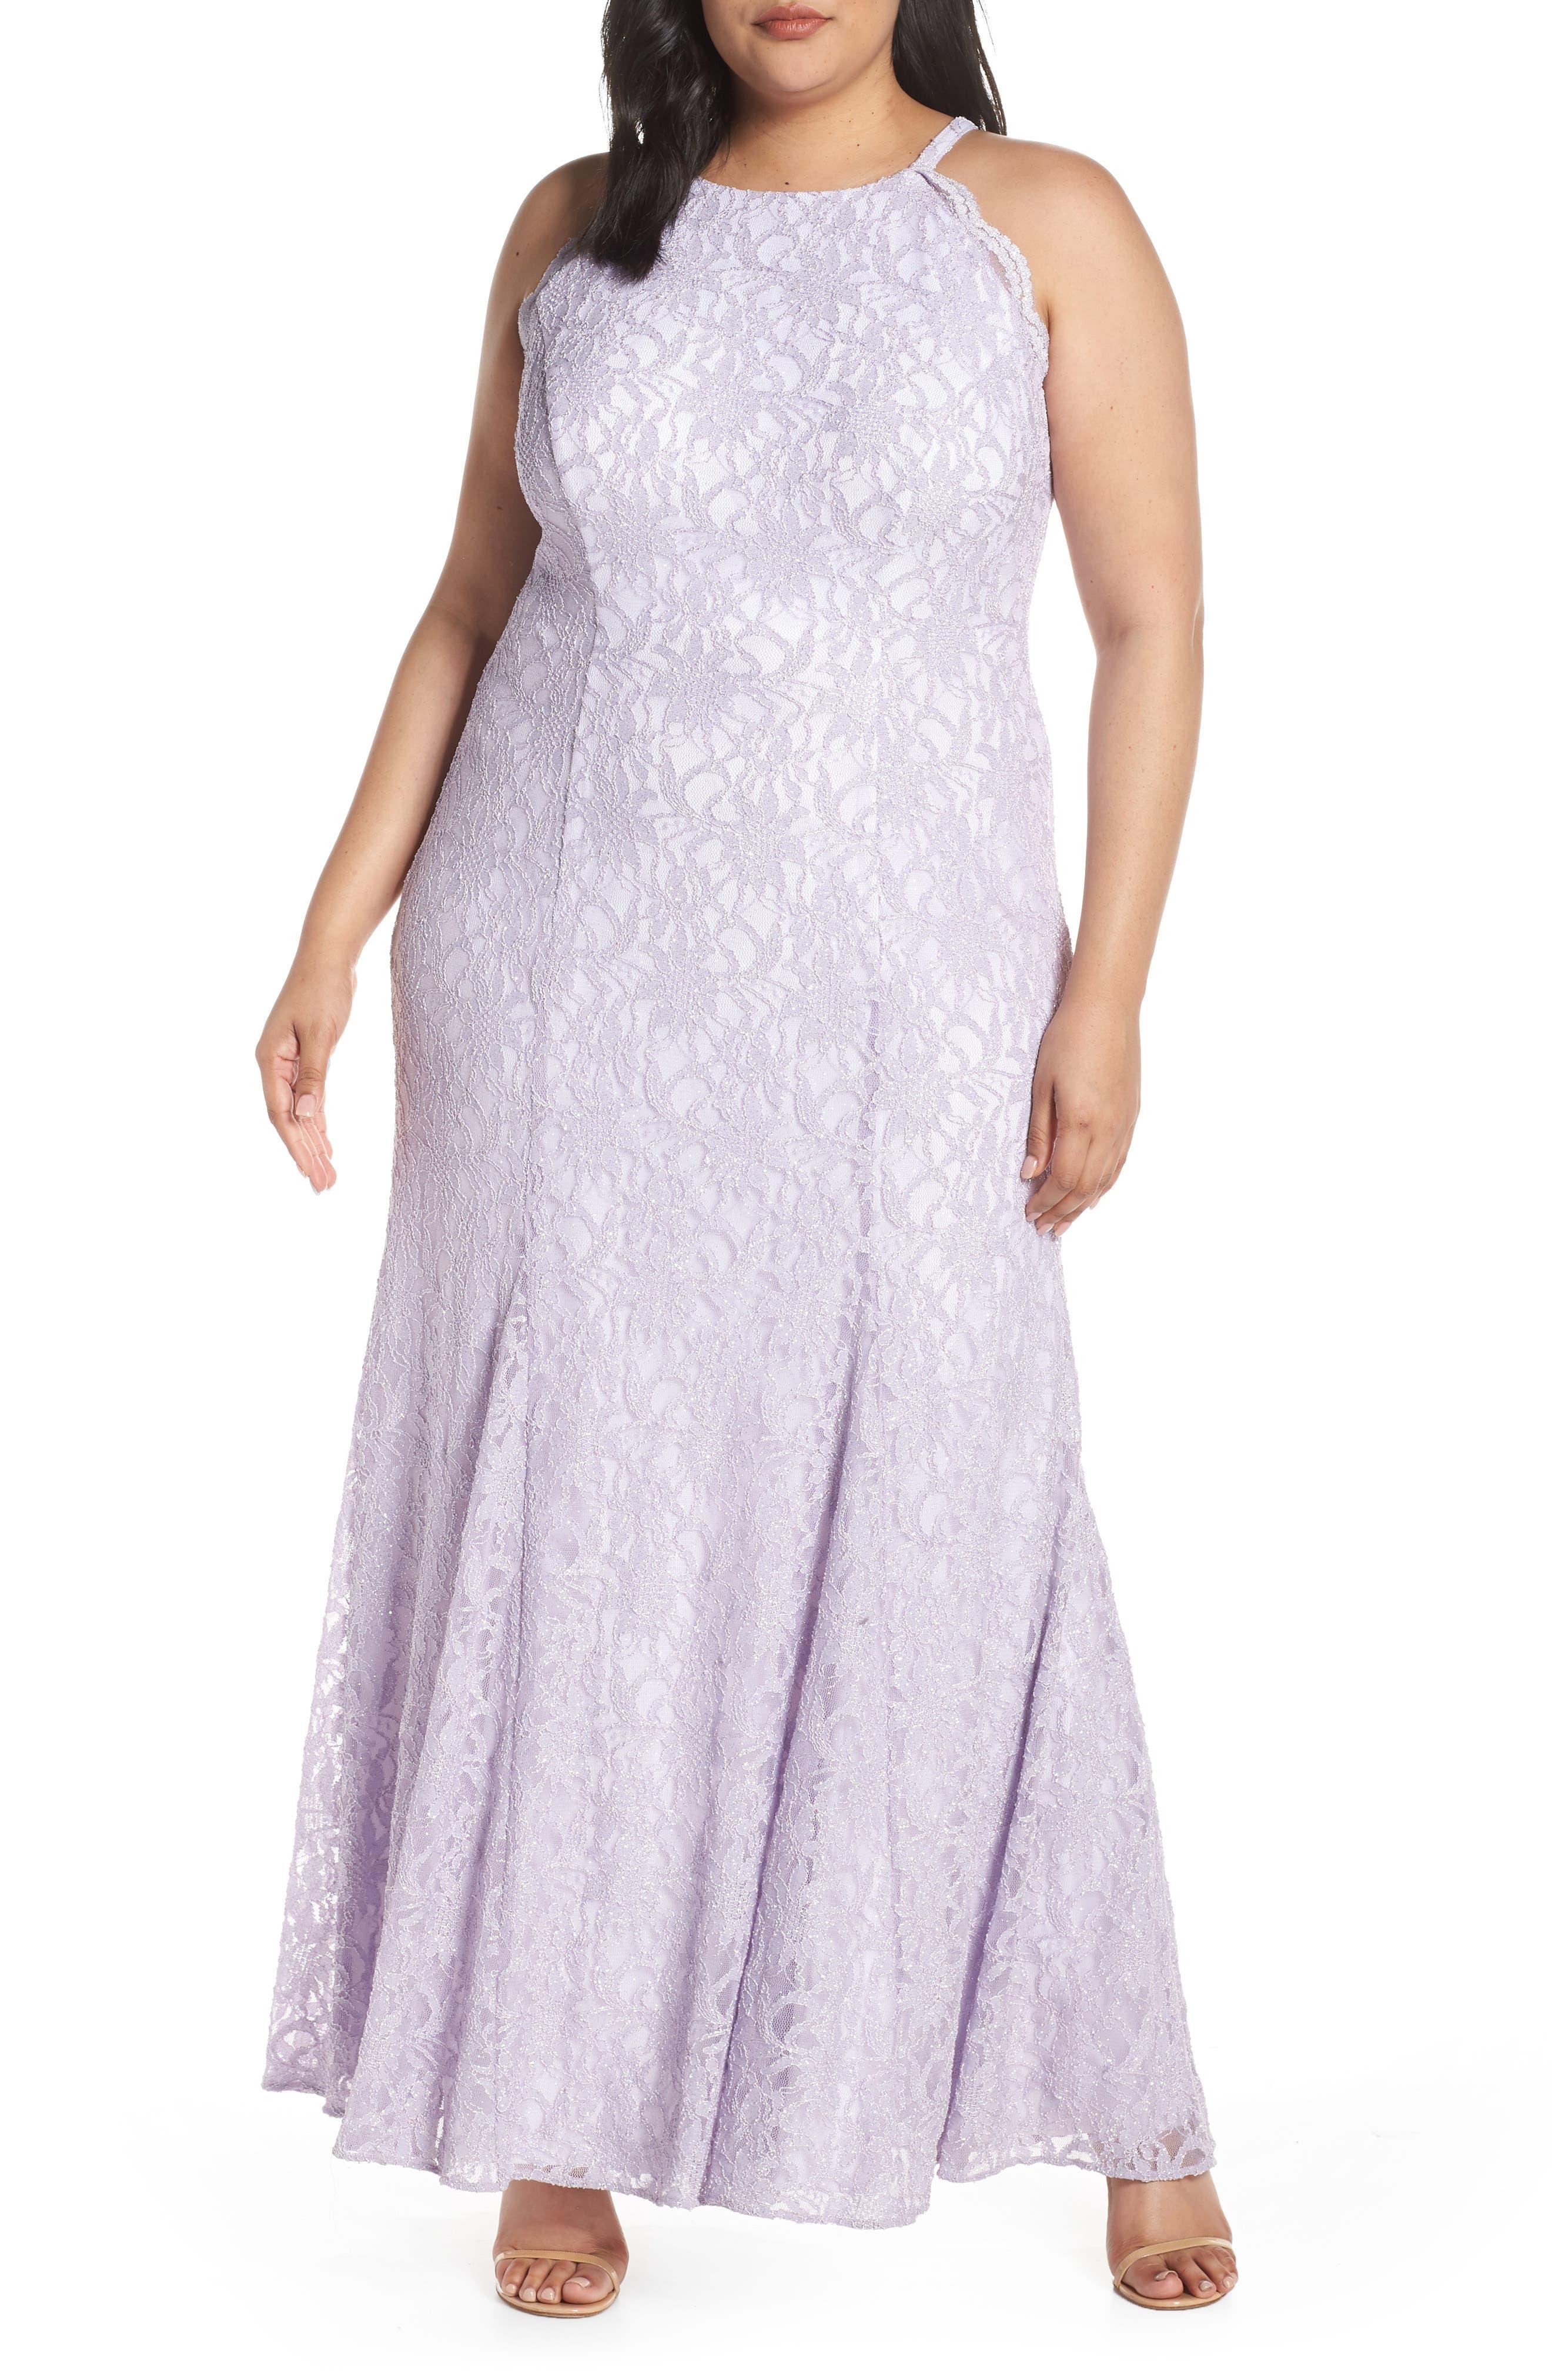 Plus Size Morgan & Co. Halter Bodice Glitter Lace Evening Dress, Purple